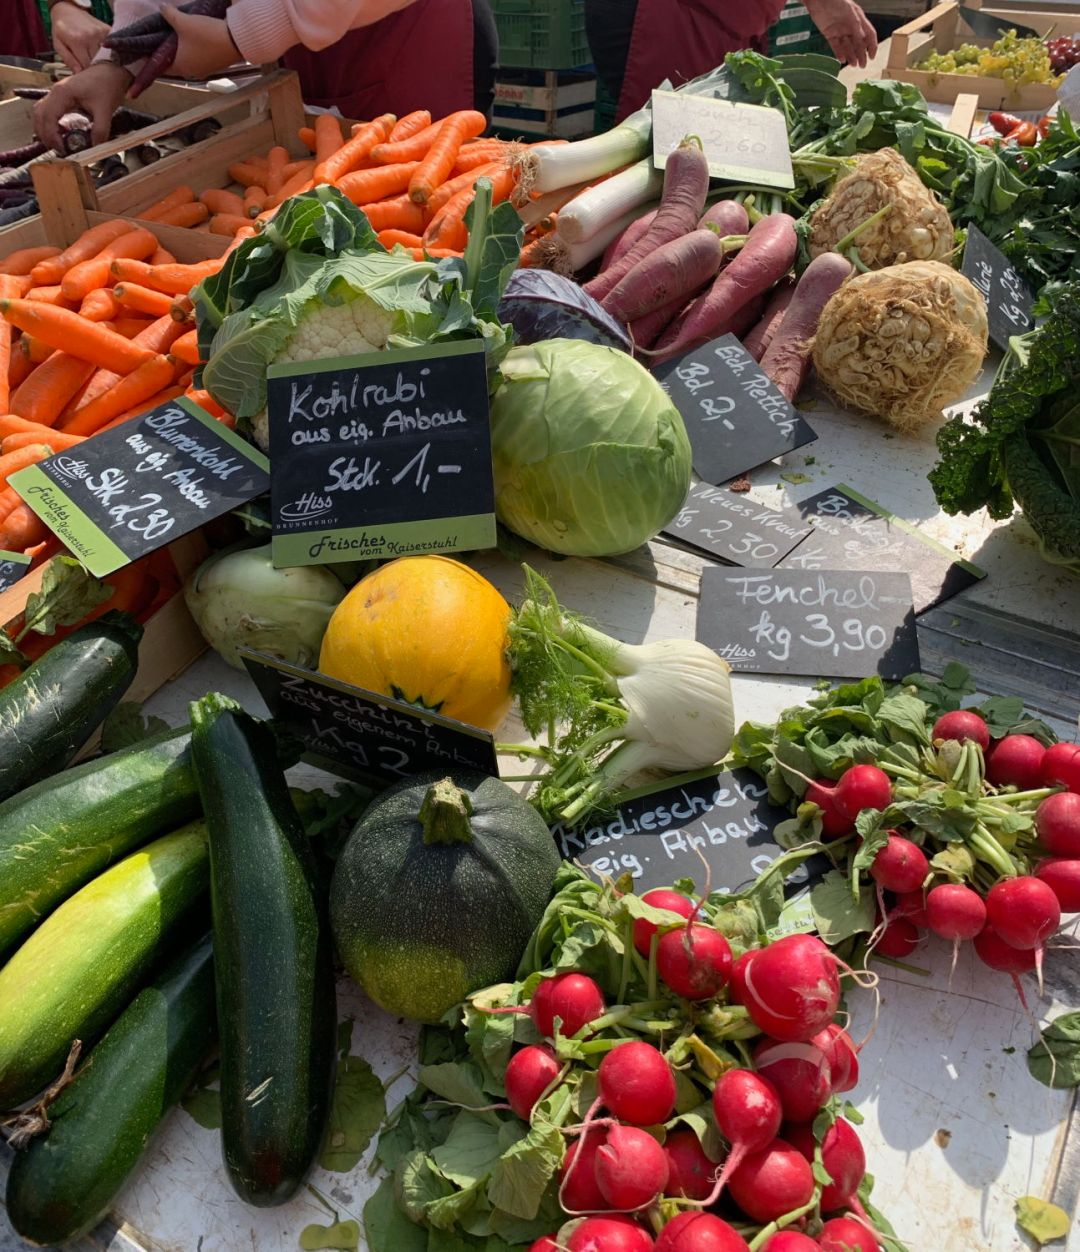 Vegetables at the Münsterplatz Food Market